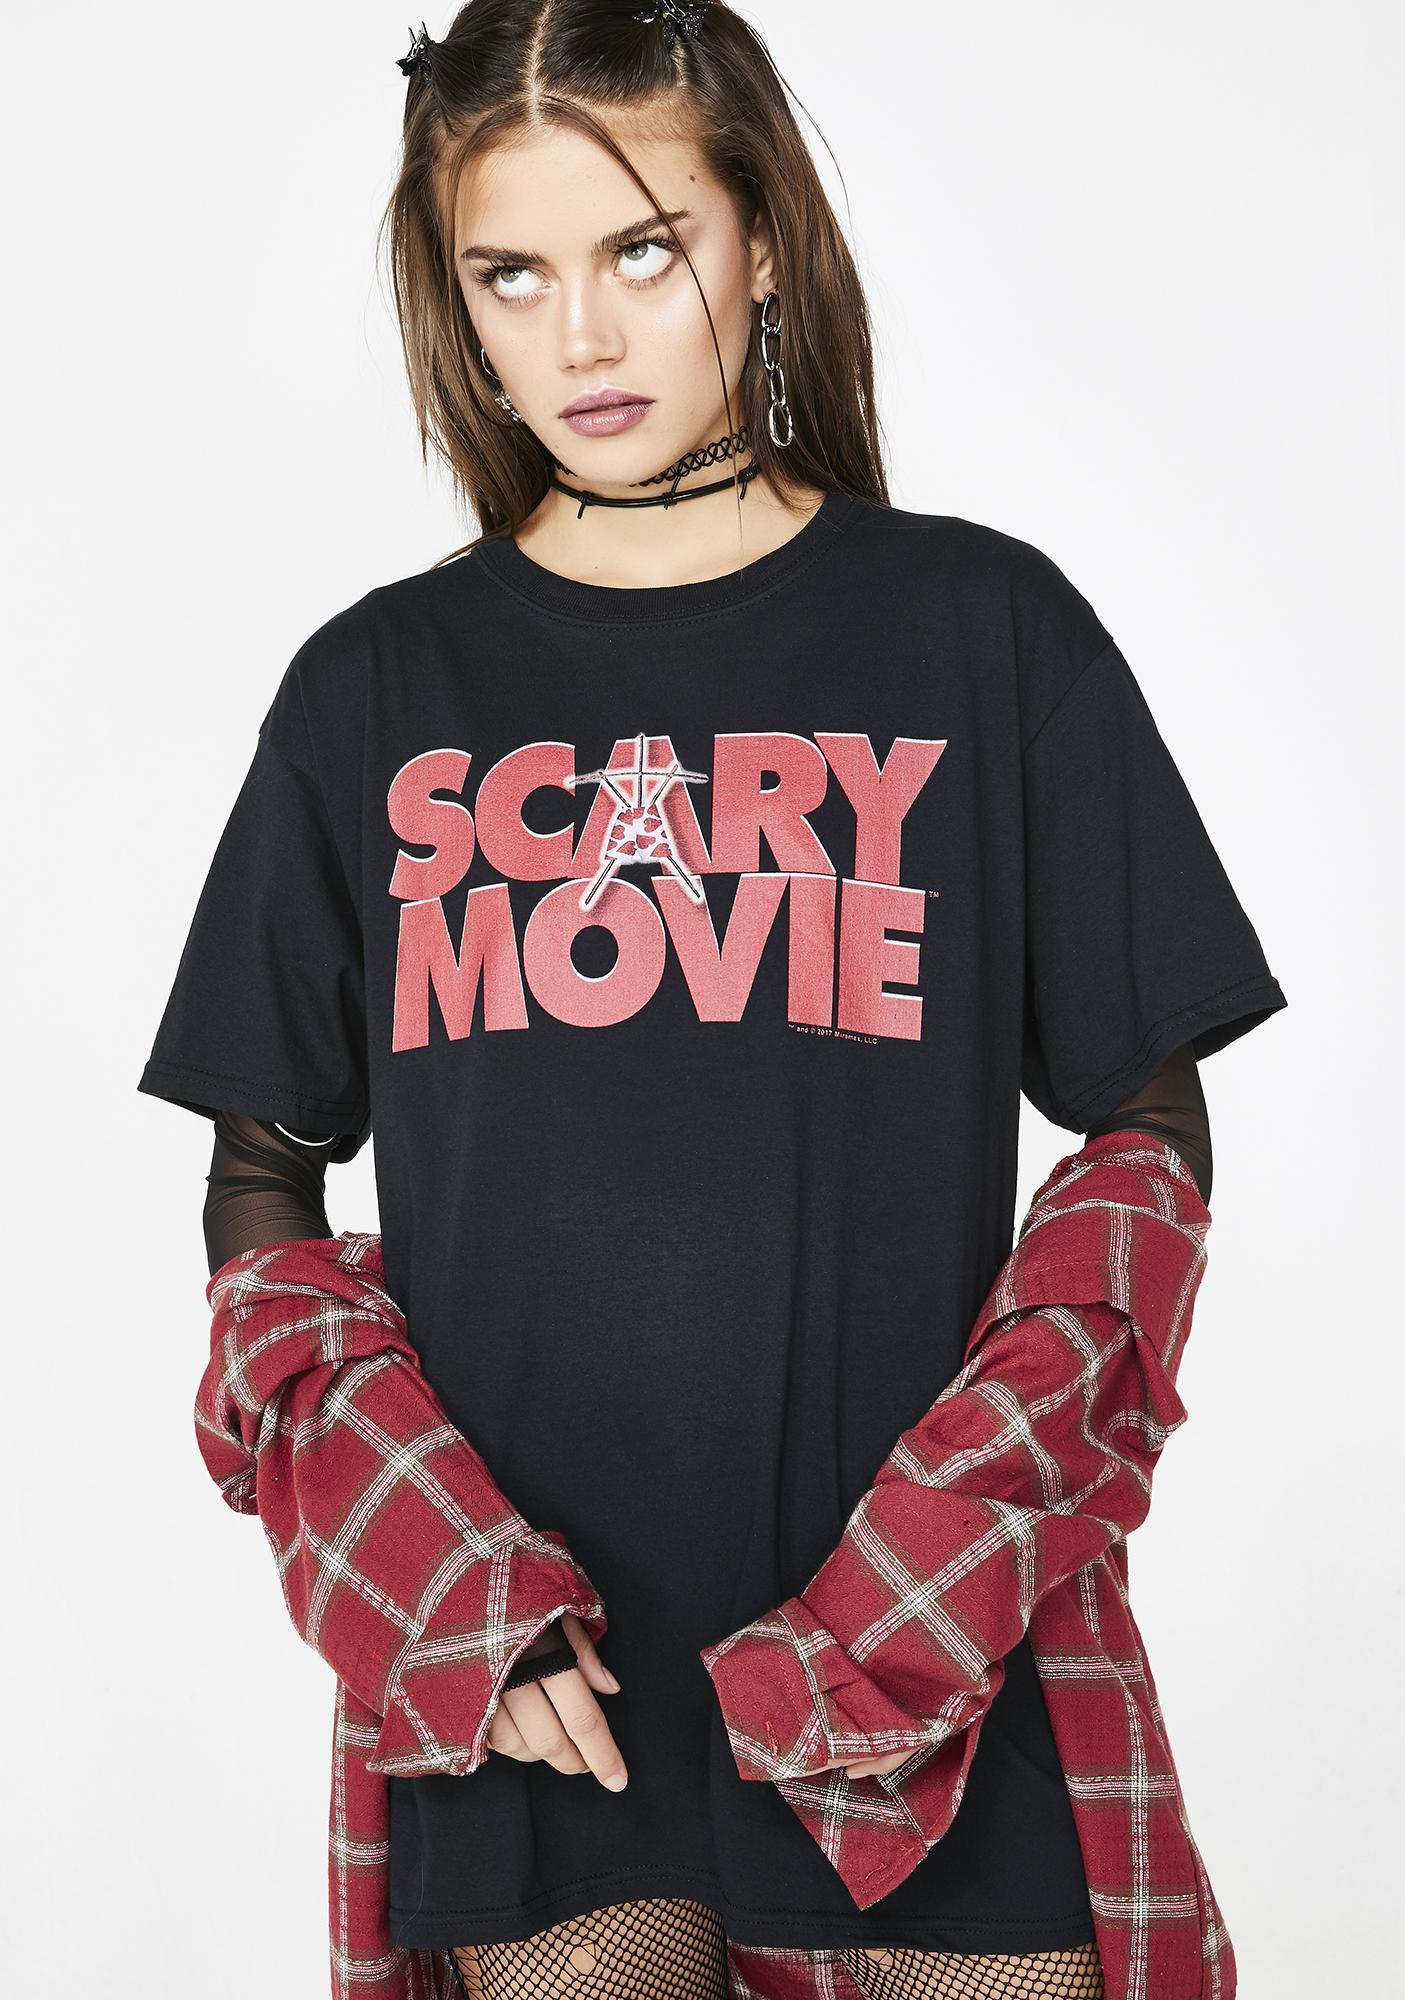 Trevco Wazzup Spooky Movie Tee